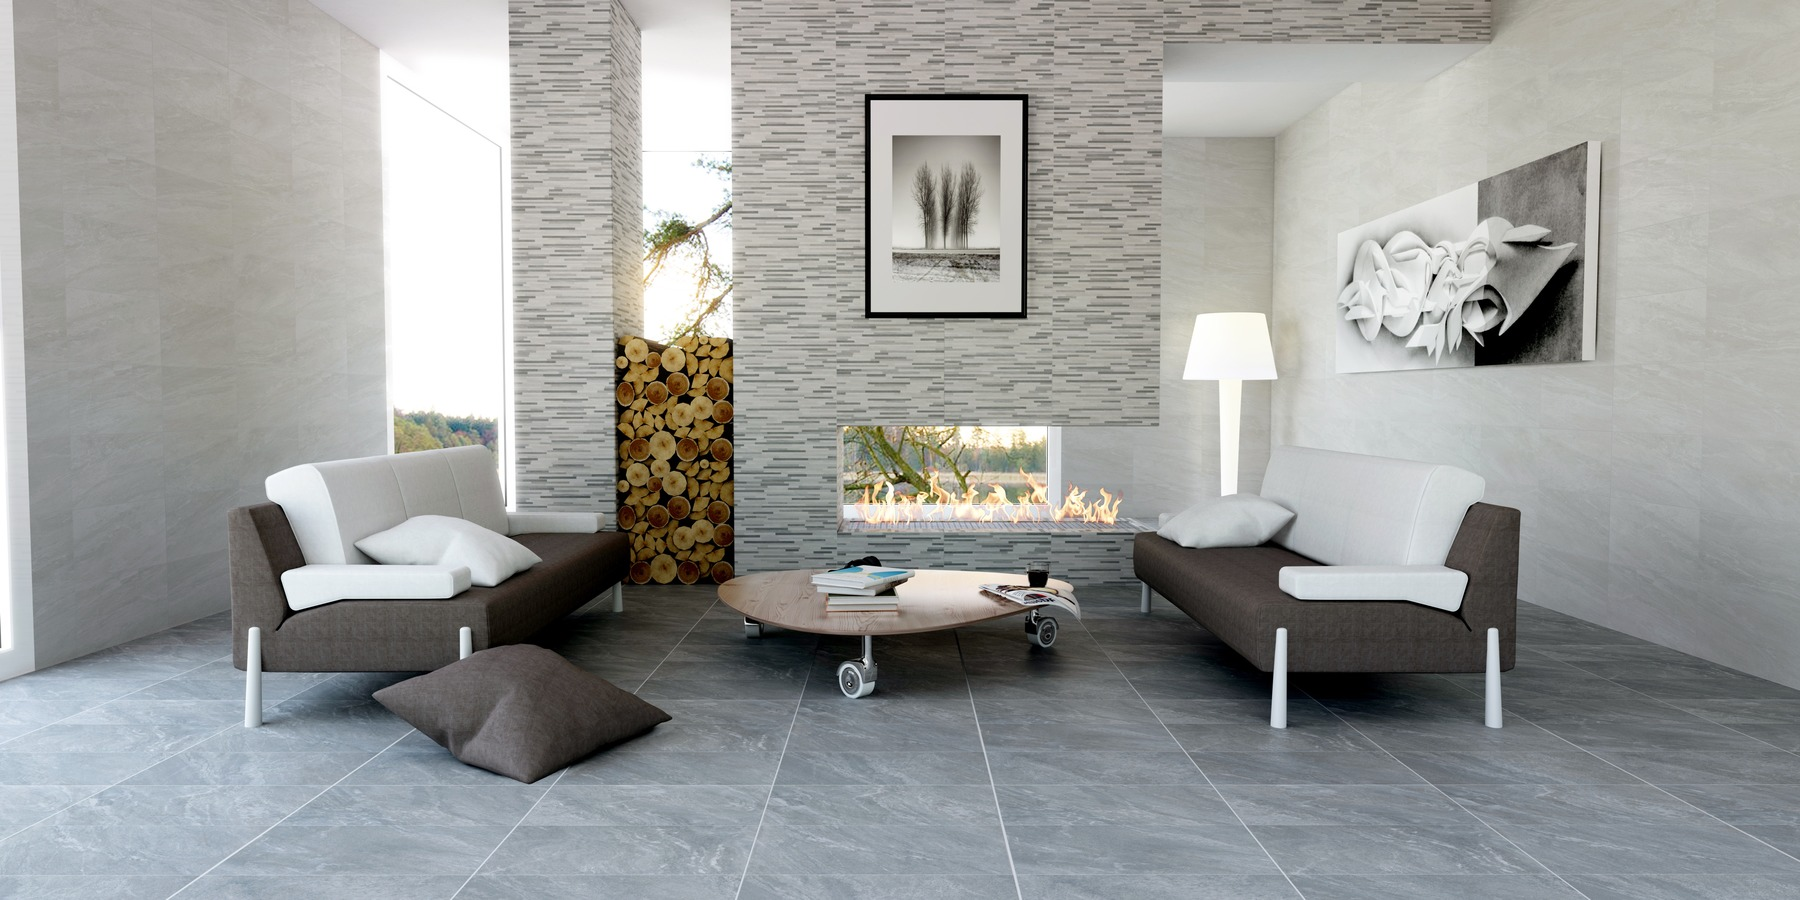 Safari Ceramic Tiles By Ecoceramic Tile Expert Distributor Of Italian And Spanish To The Usa